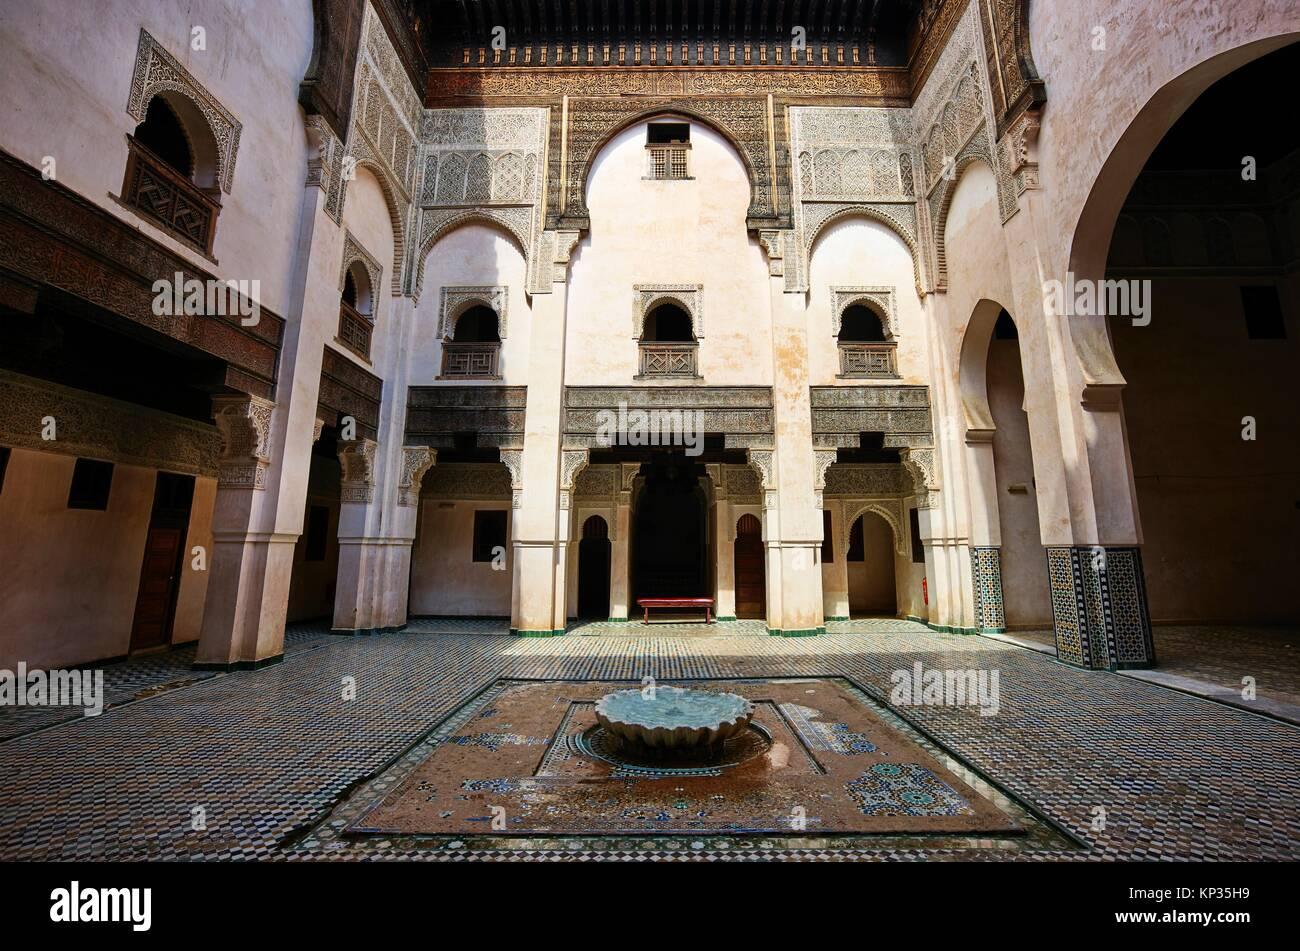 Rascherratine Medersa in the medina of Fez, Morocco - Stock Image